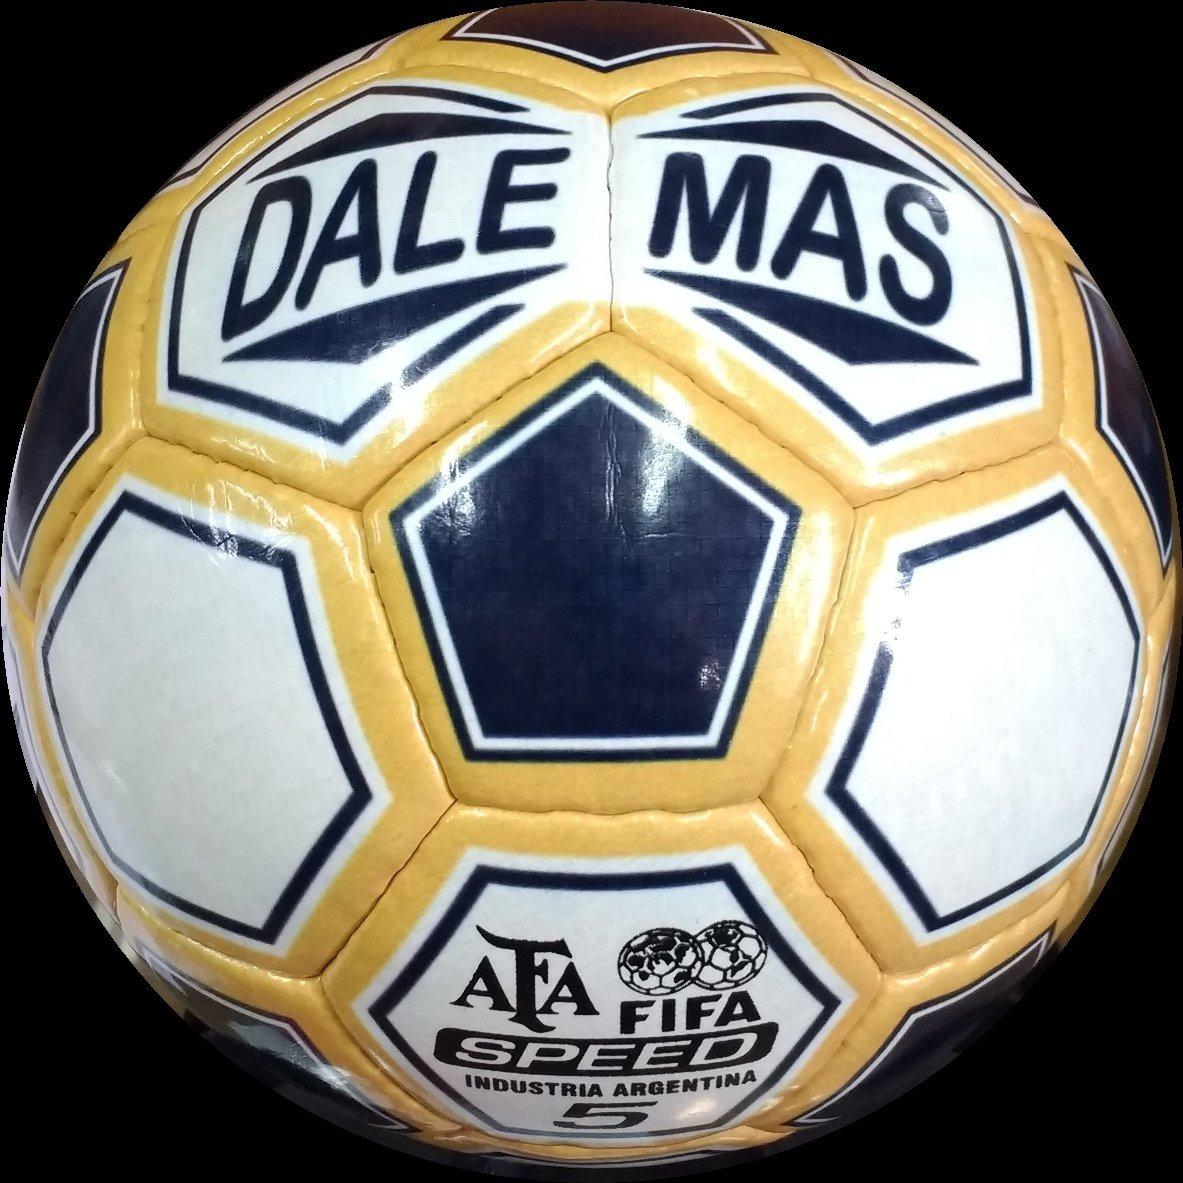 5a4ea3e627369 Pelotas futbol dalemas speed ofic afa fifa profesional jpg 1183x1183 Fifa  pelota de ligas